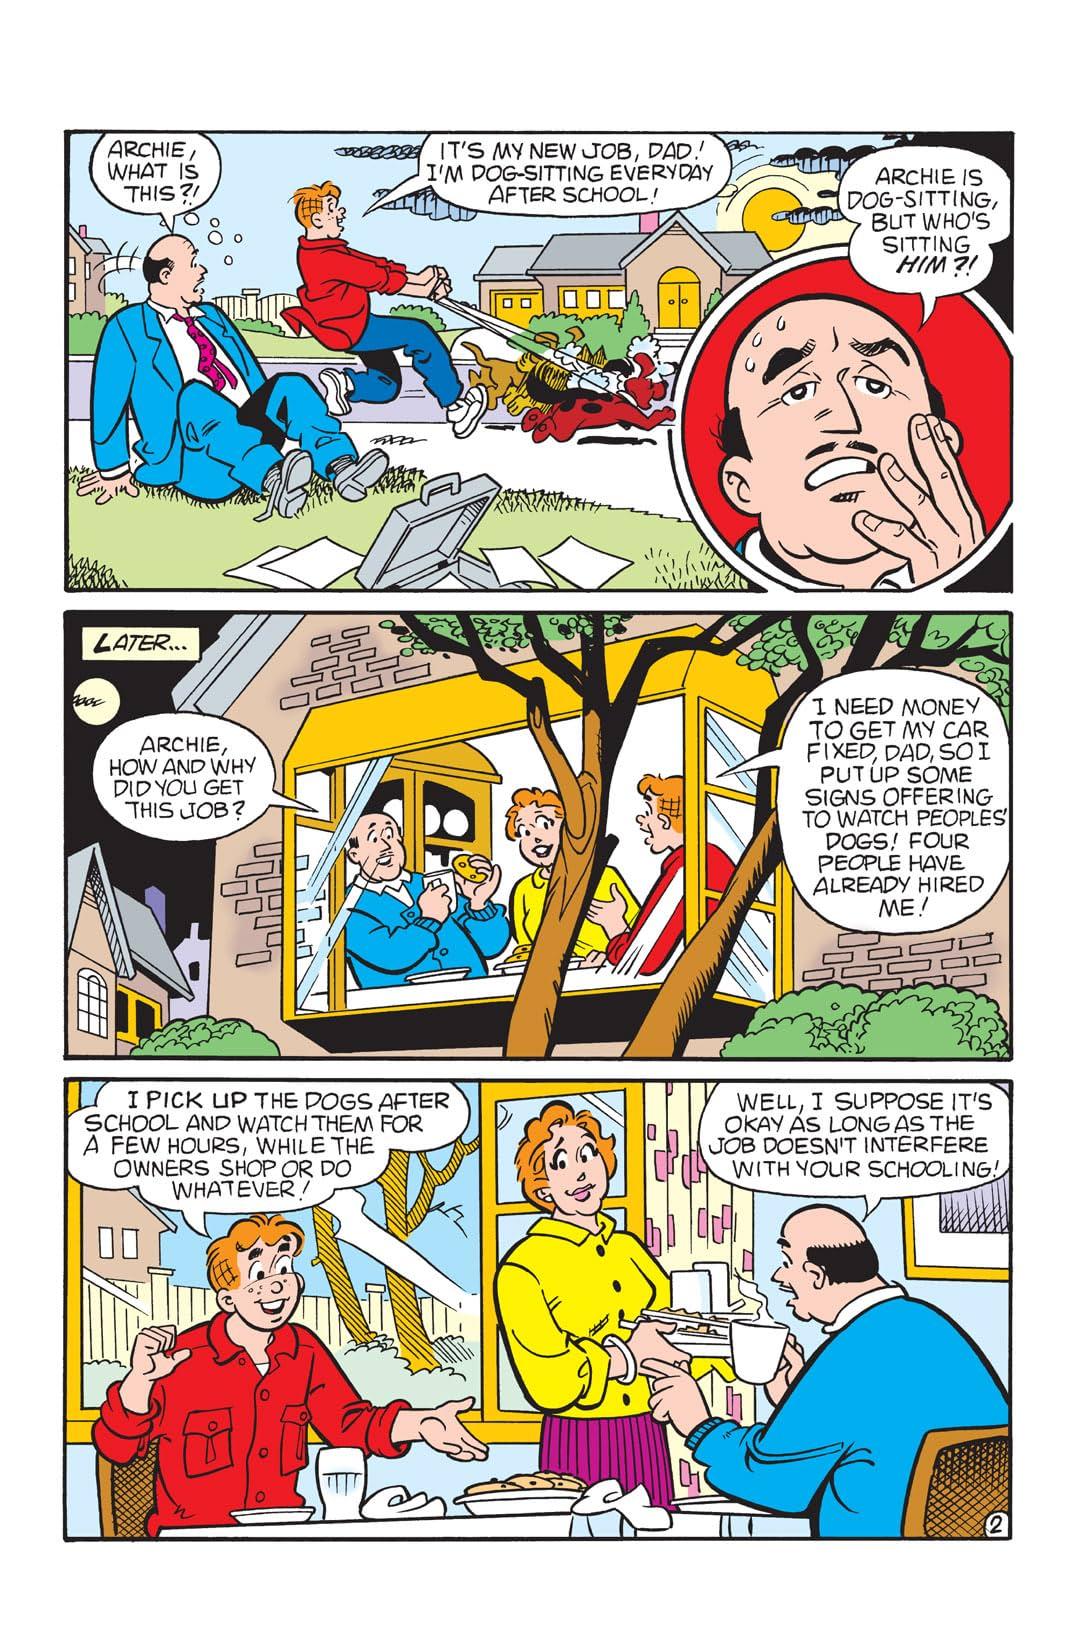 Archie #534